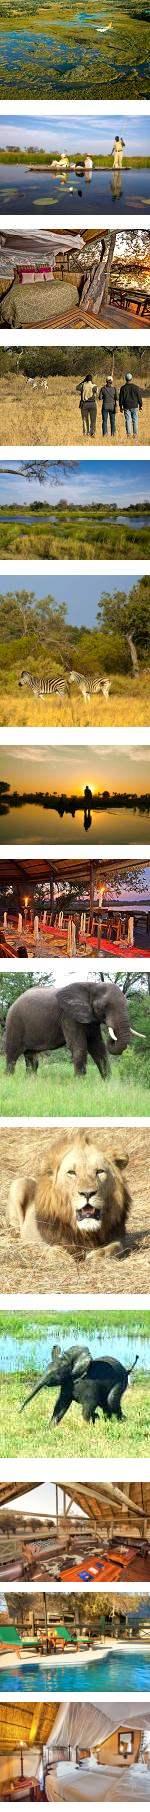 Botswana Safari  - Easy and Affordable